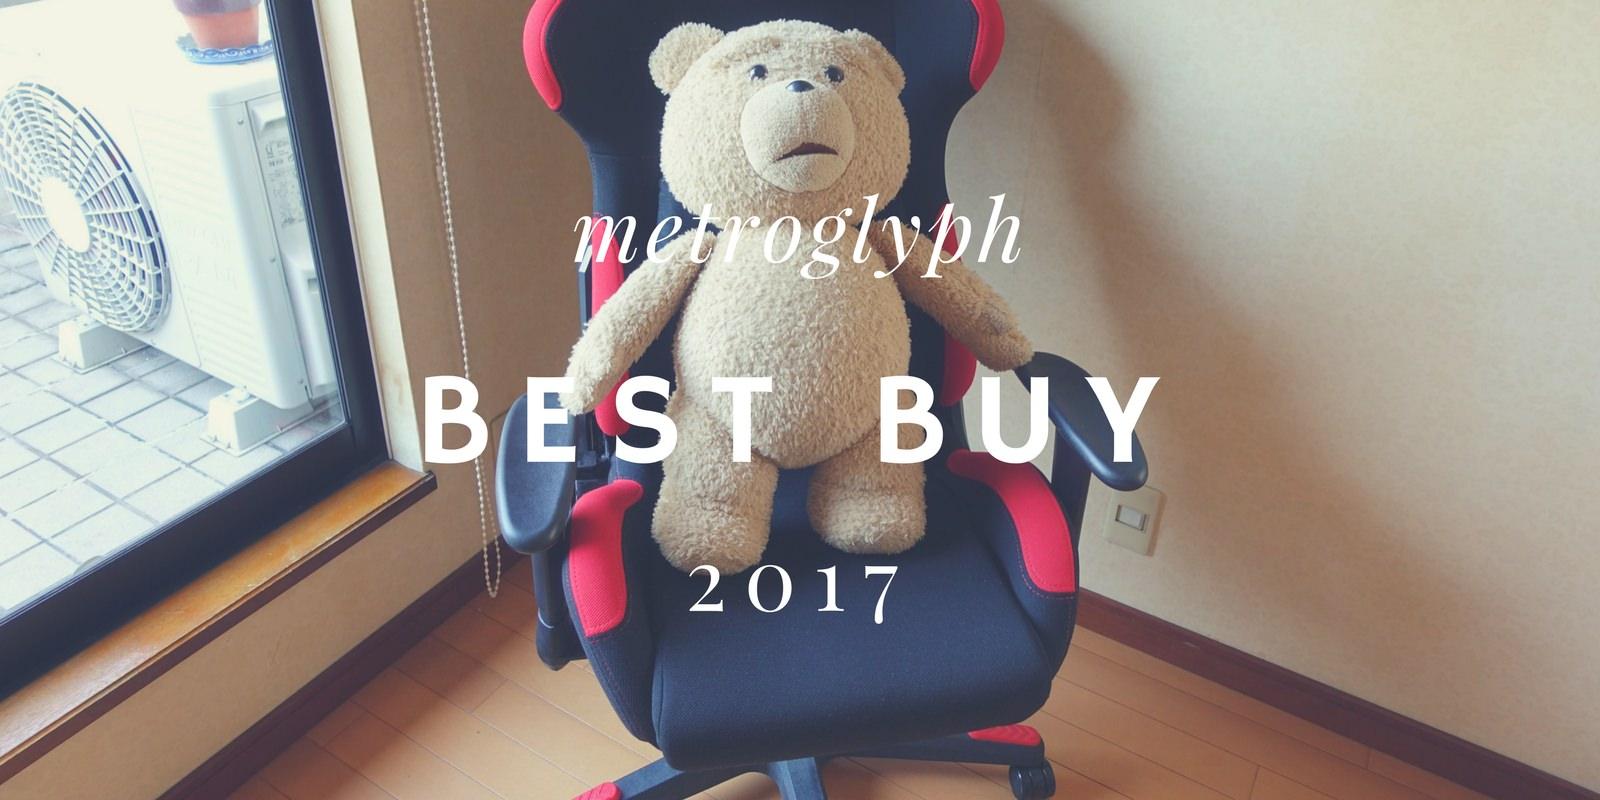 Bestbuy 2017